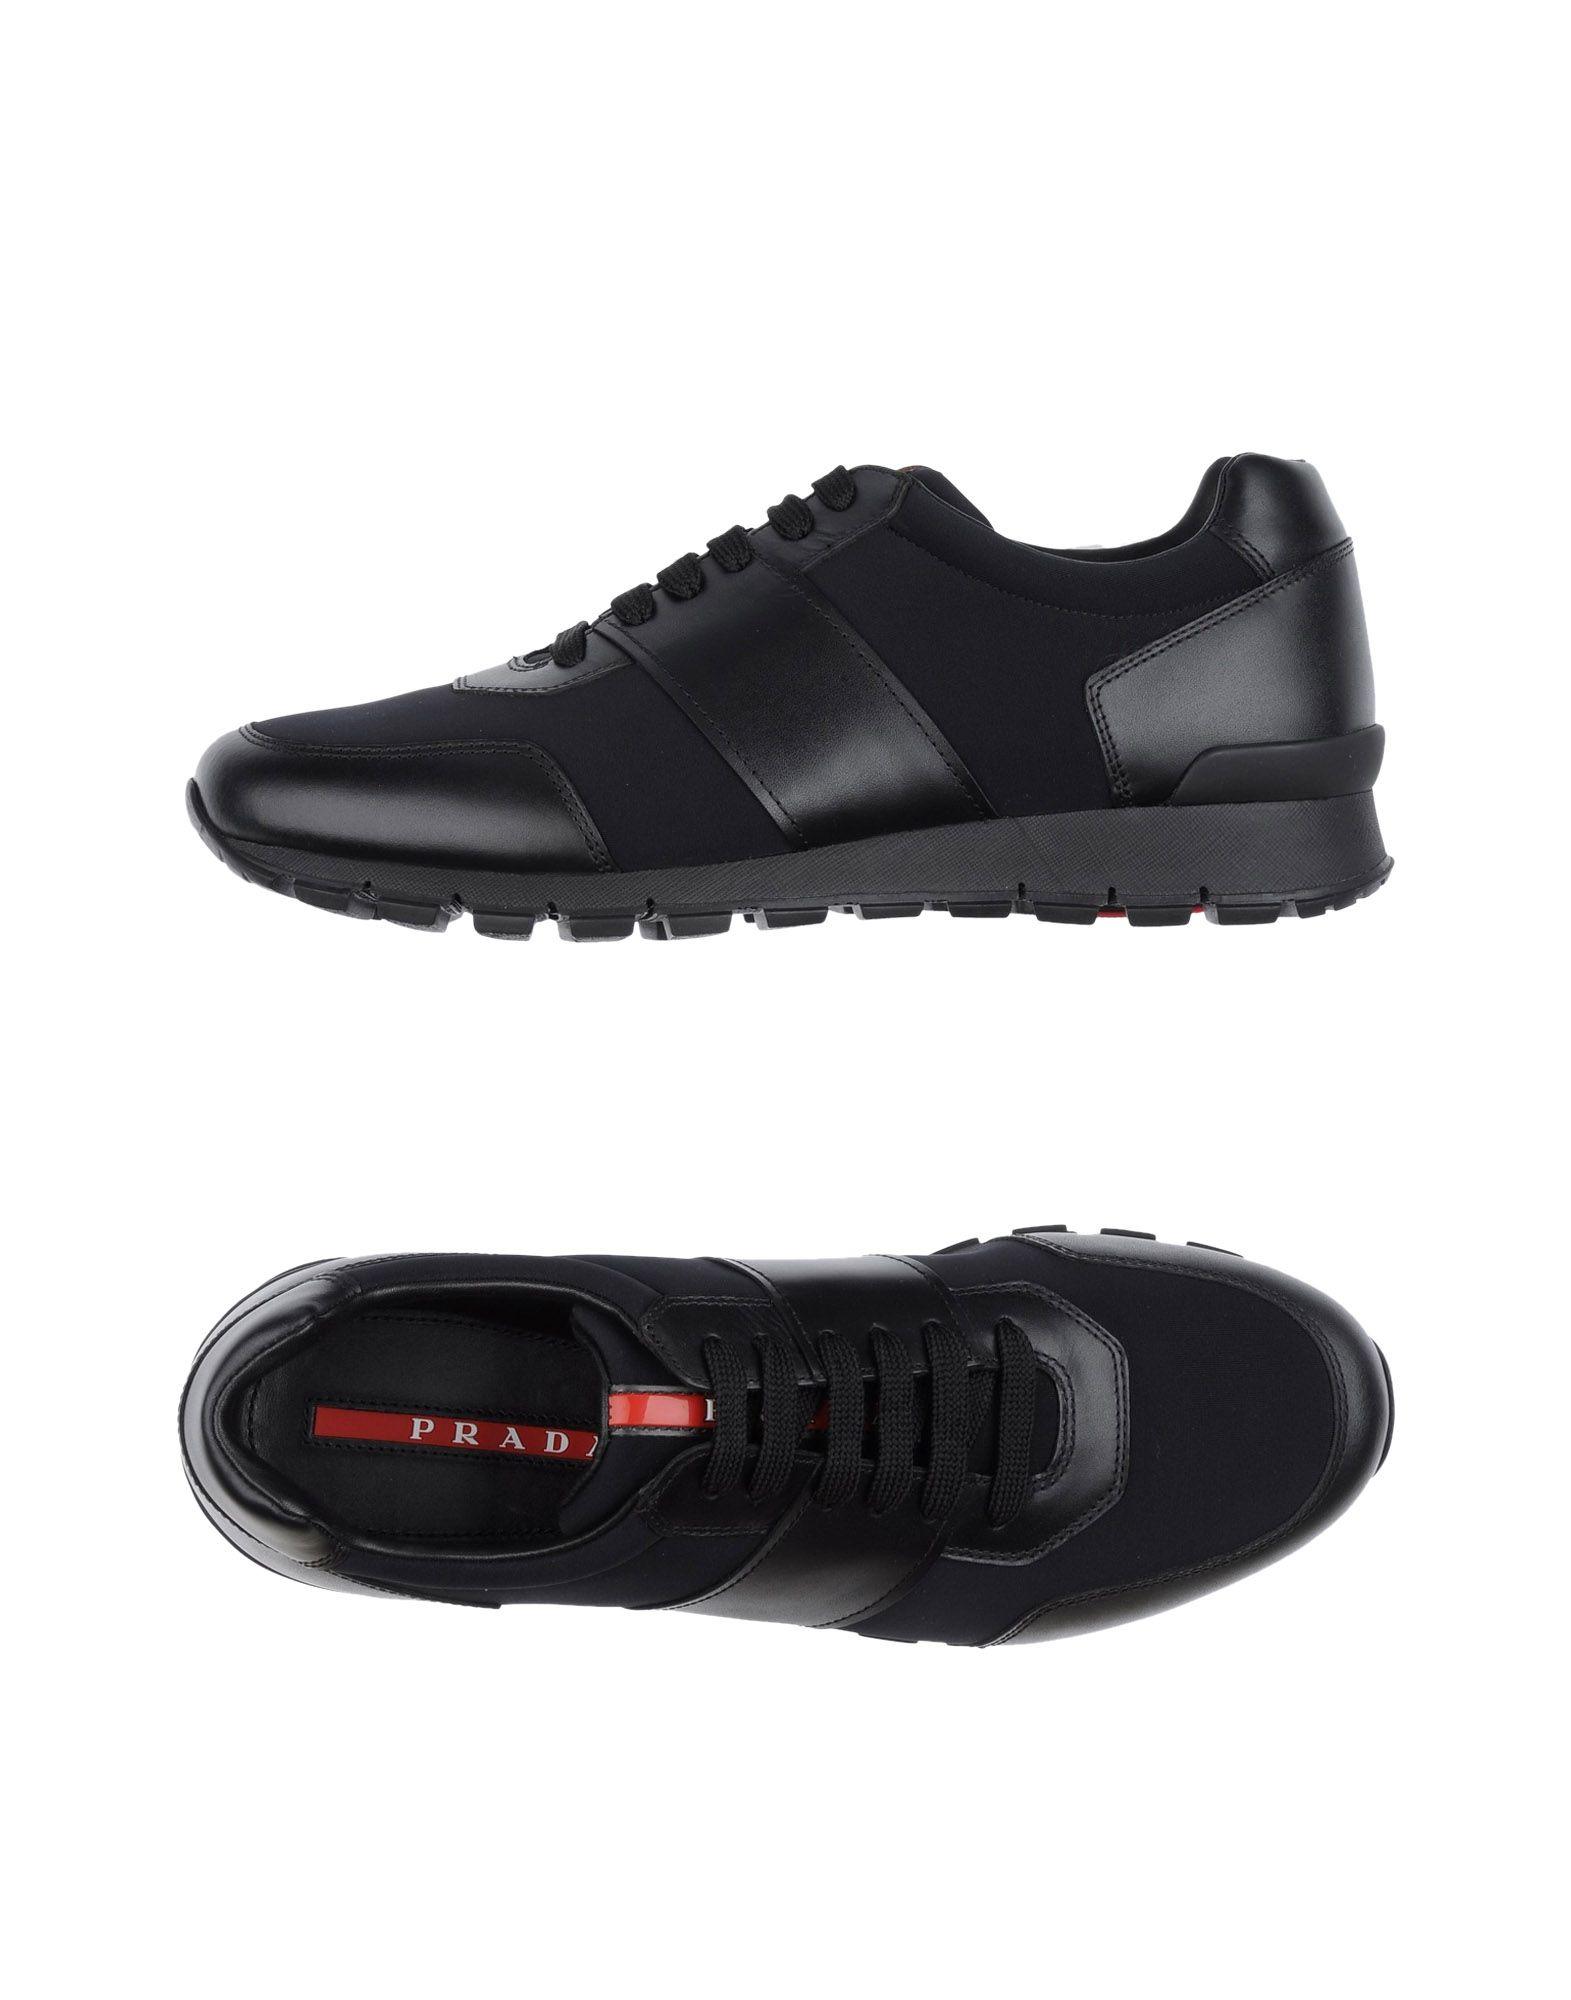 Prada Sport Sneakers Herren  11243401OG Gute Qualität beliebte Schuhe